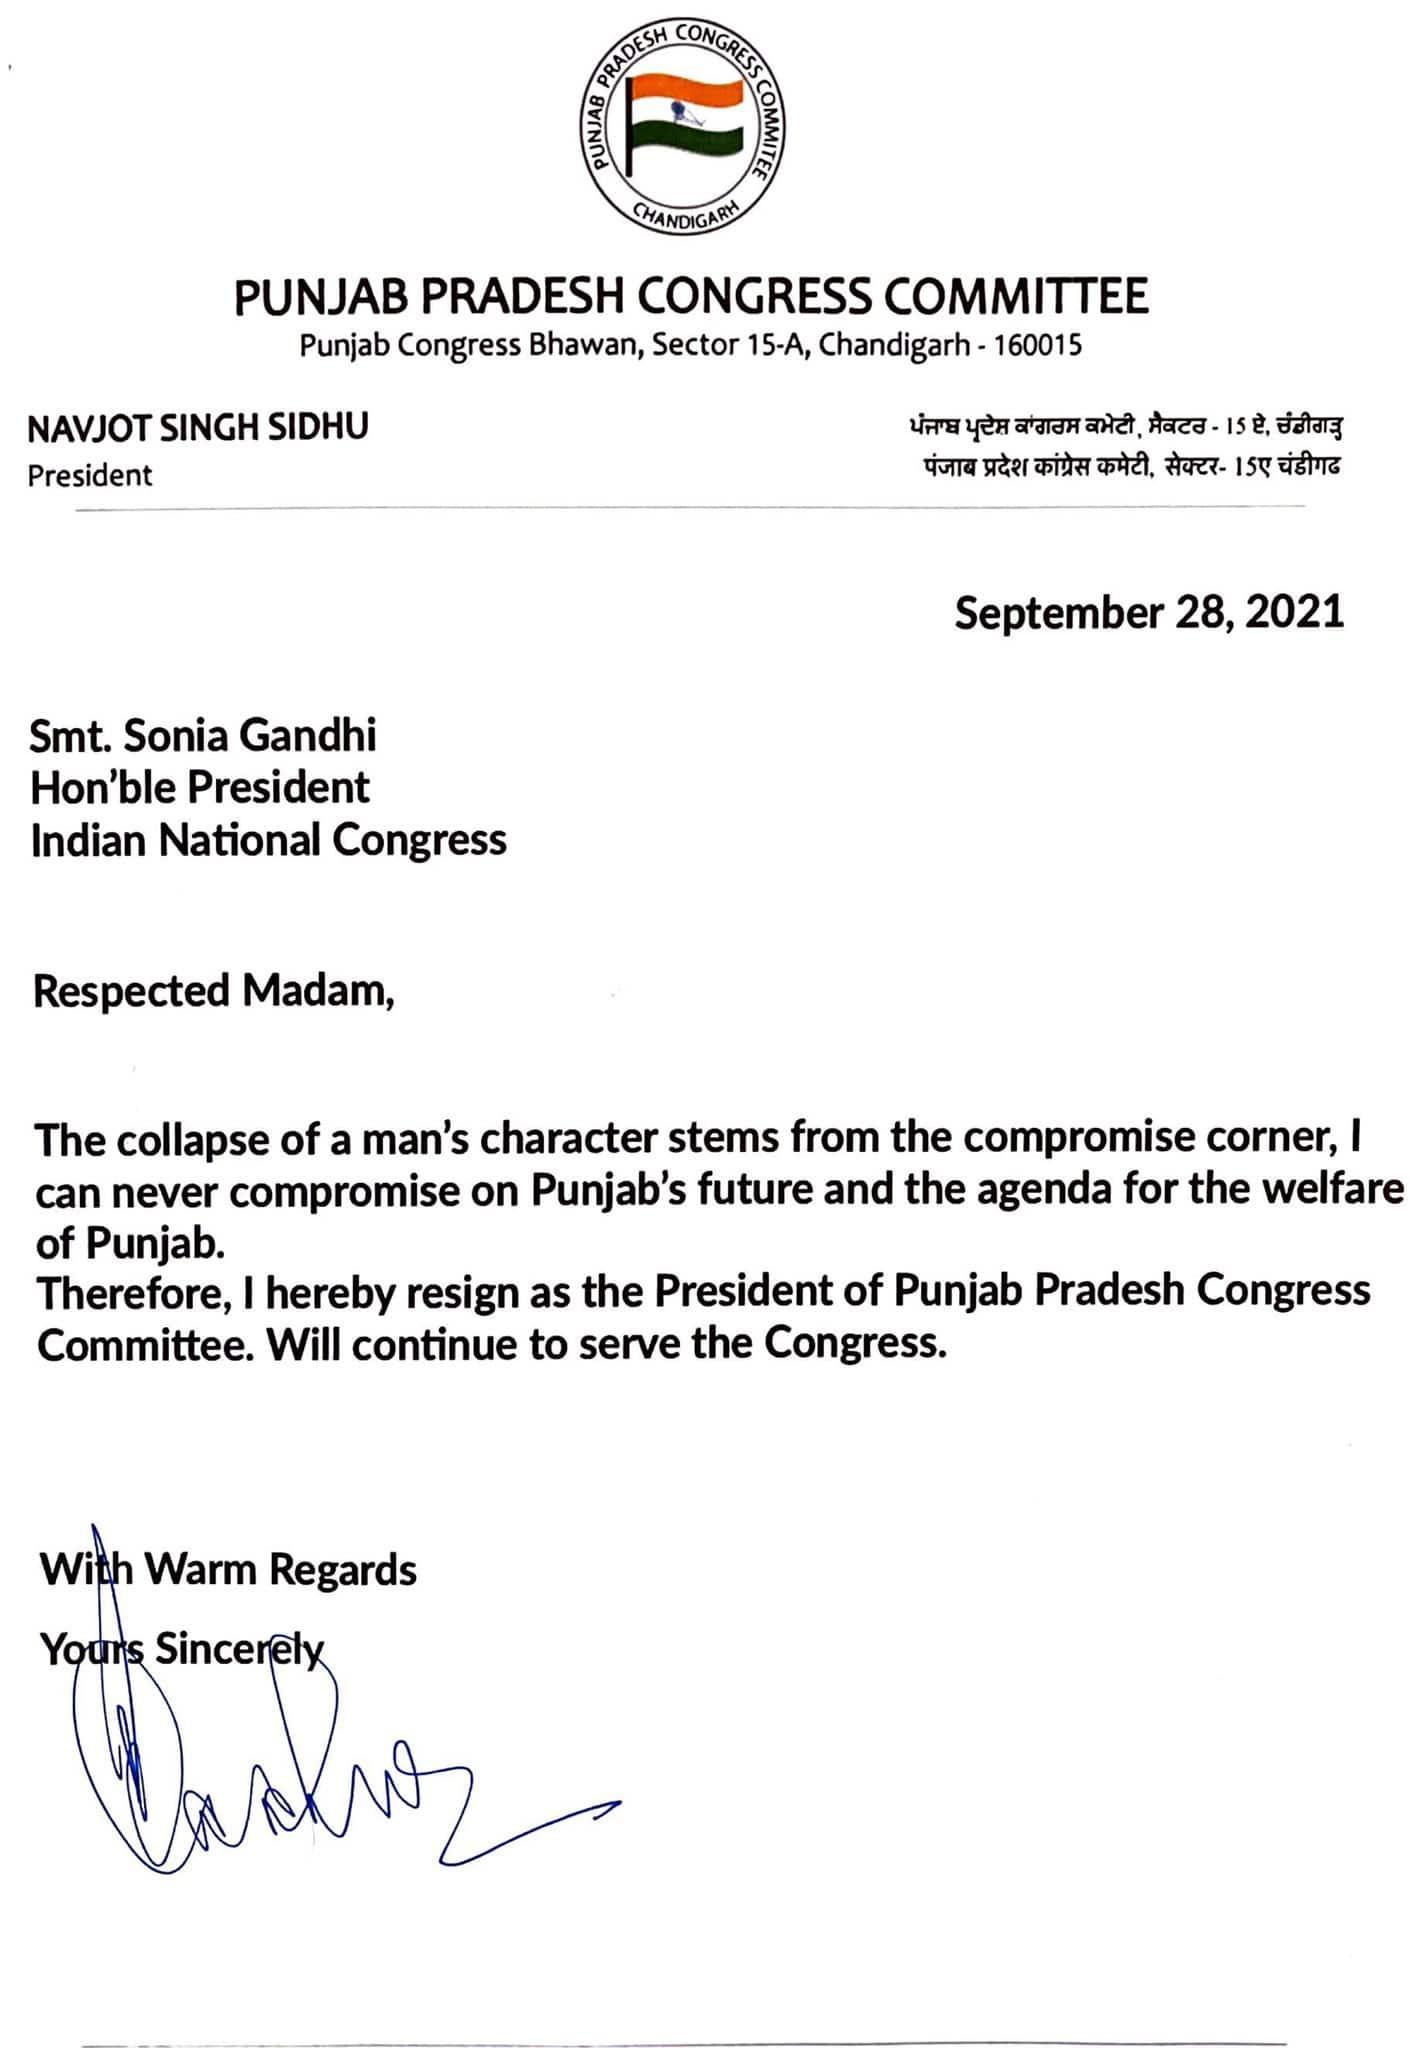 Navjot Singh Sidhu resigned